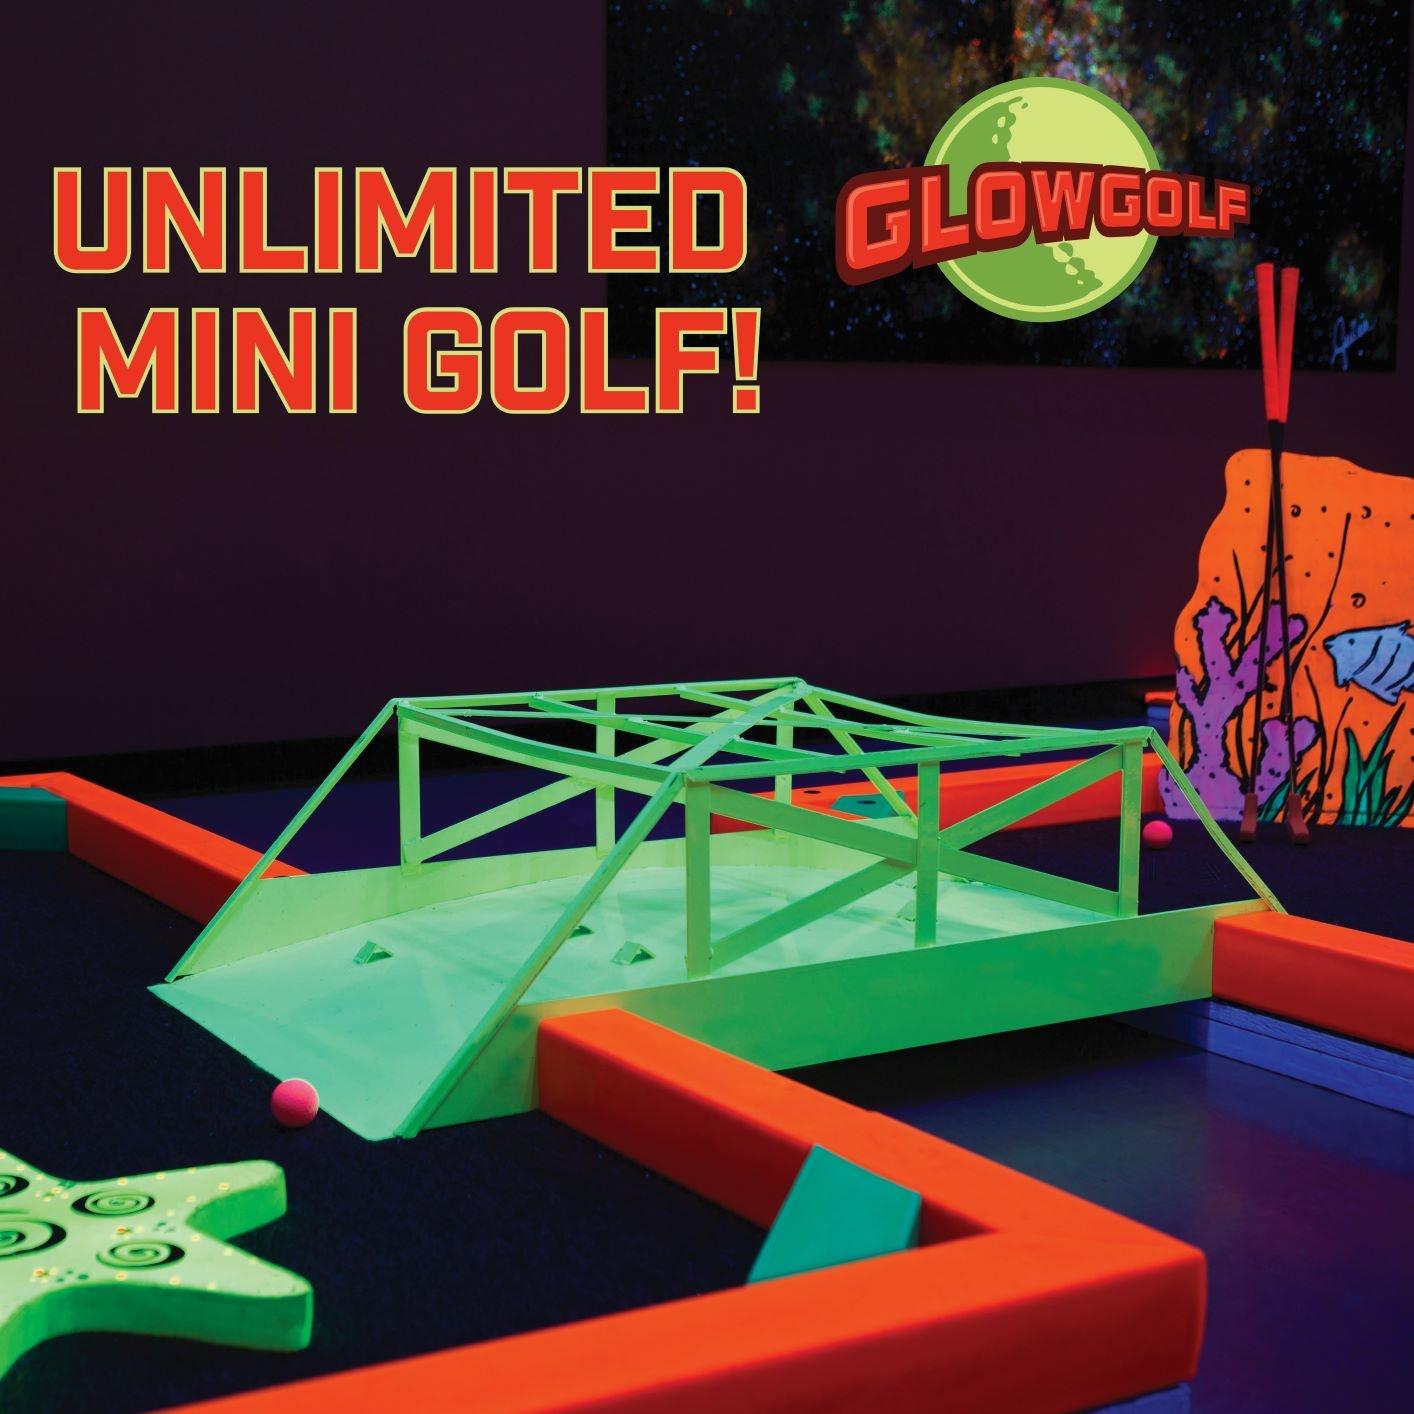 Unlimited Mini Golf from Glowgolf